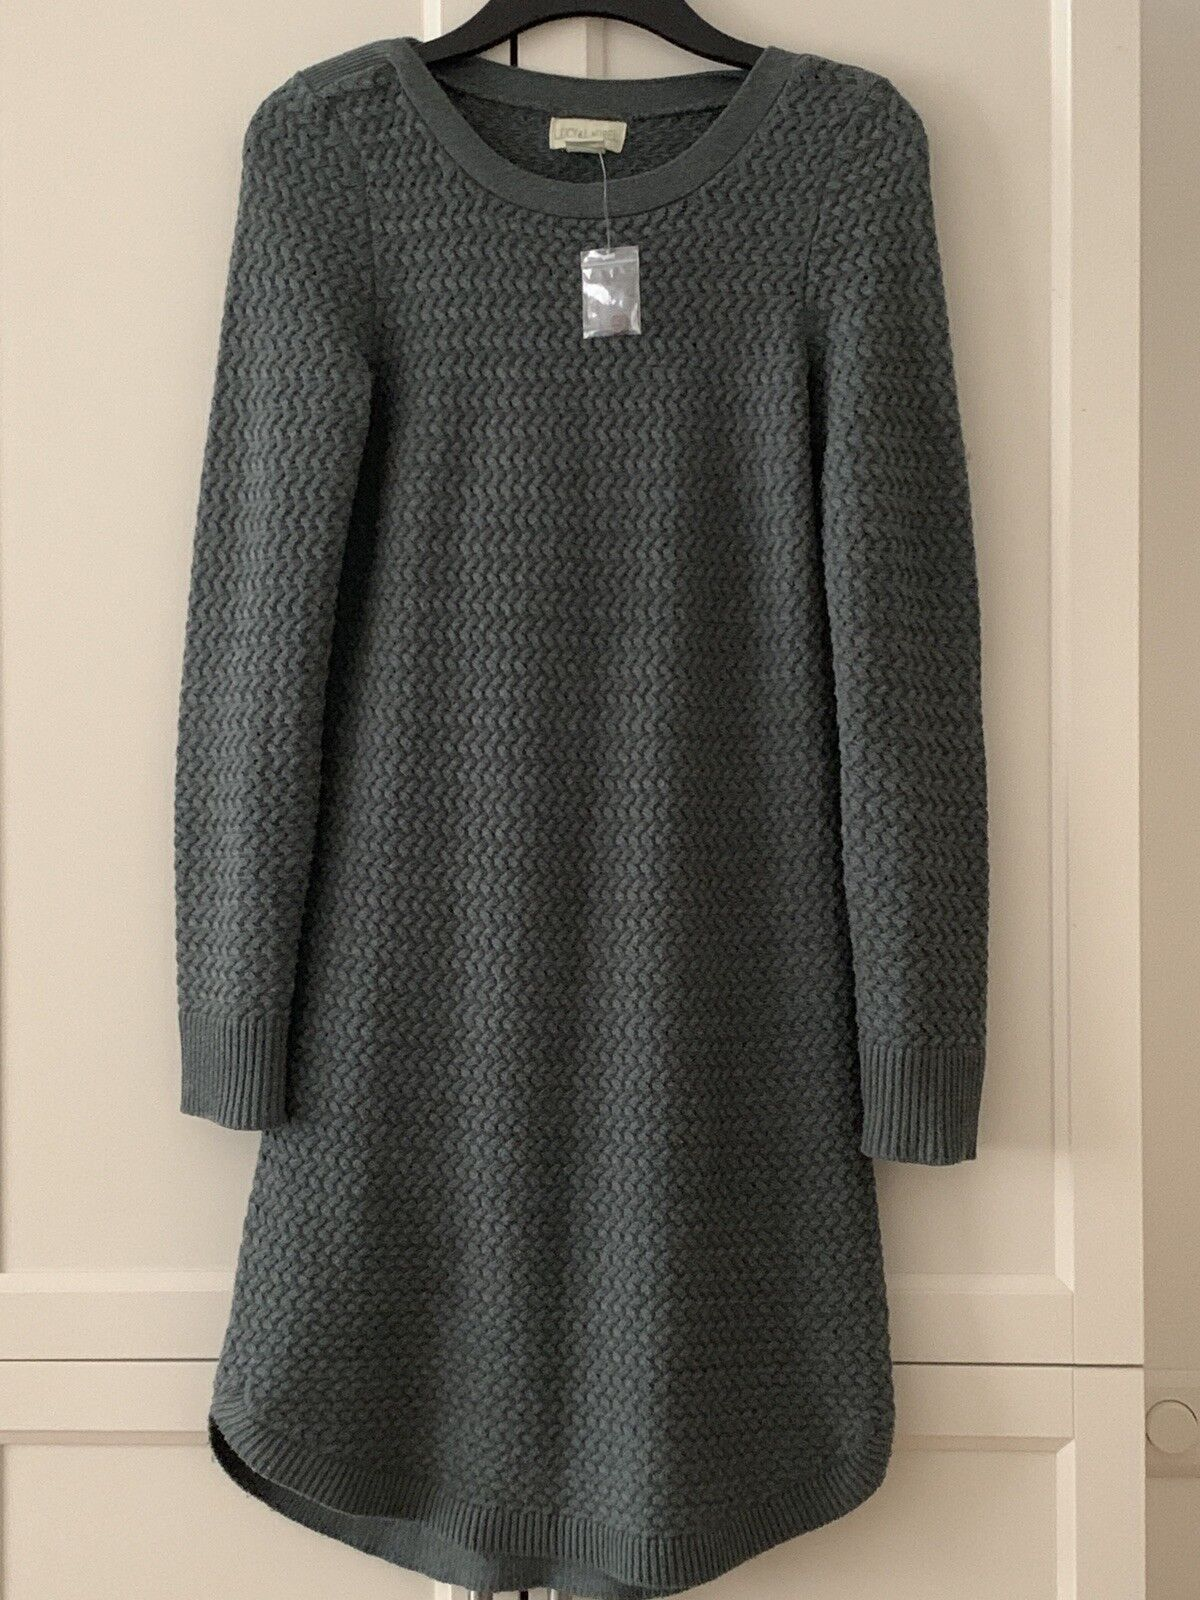 Strick Kleid Grün Schilfgrün Gr S Neu